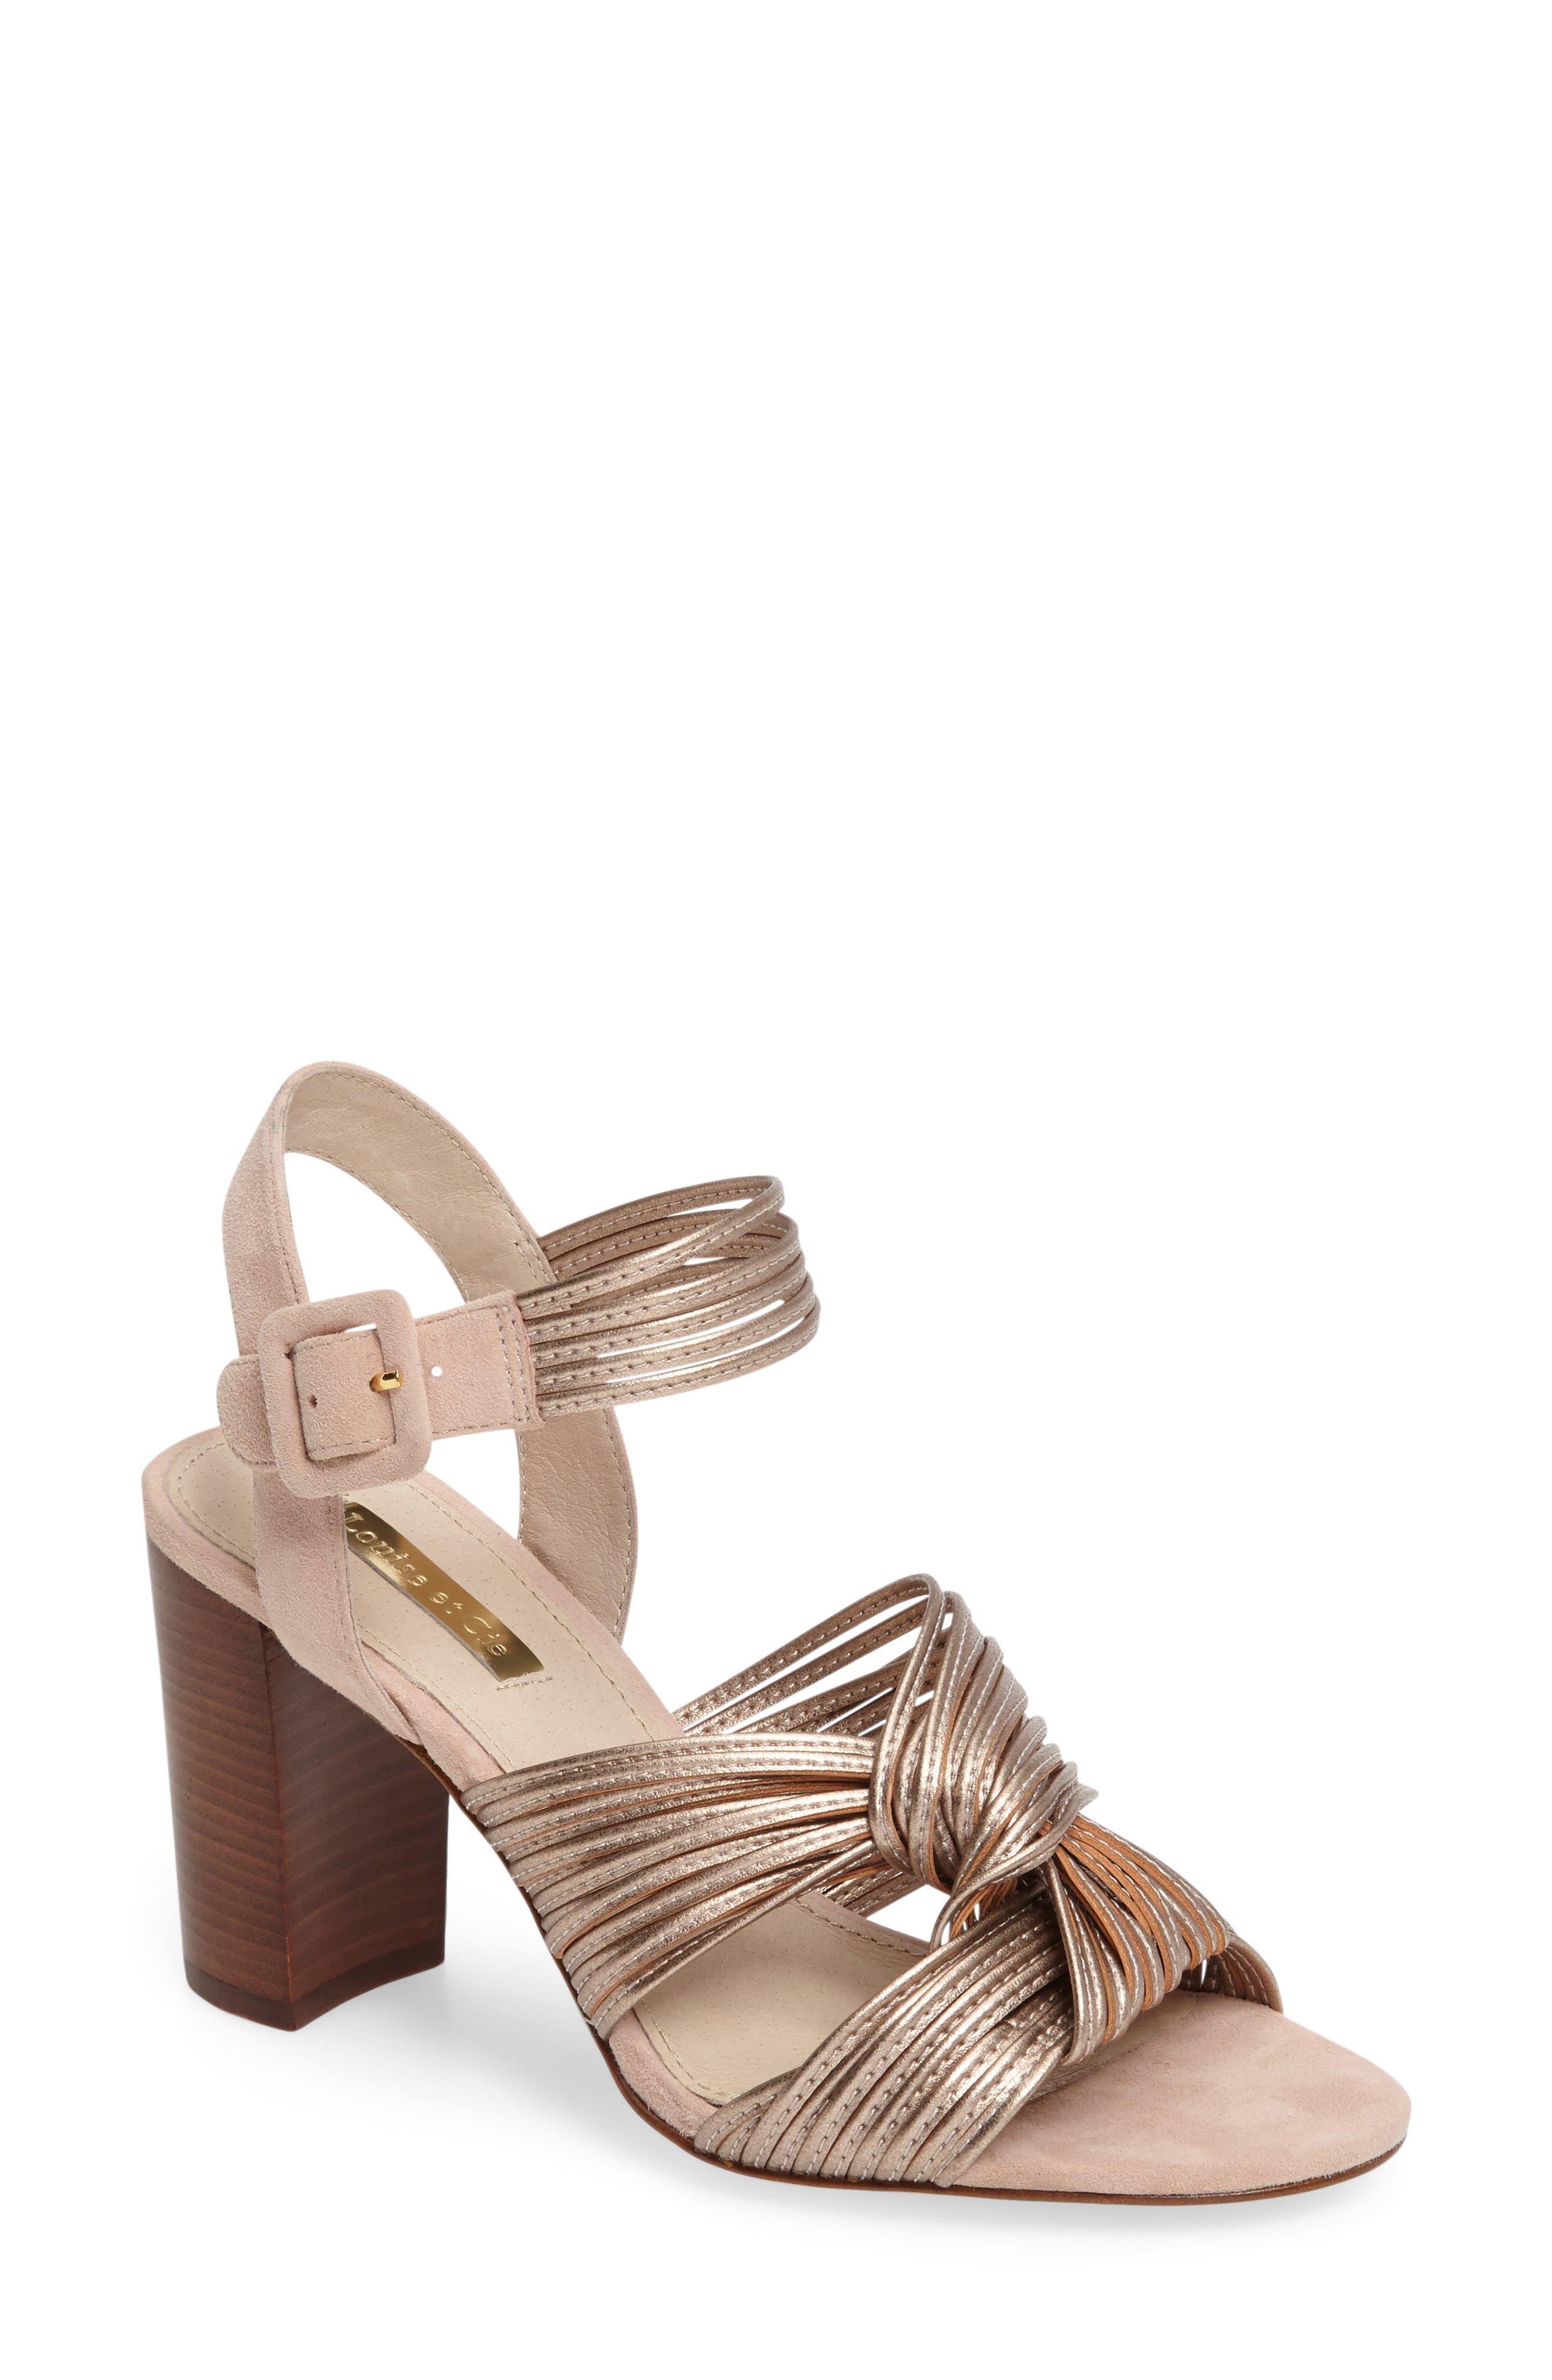 Kamden Knotted Block Heel Sandal,                         Main,                         color, Rose Gold Faux Leather